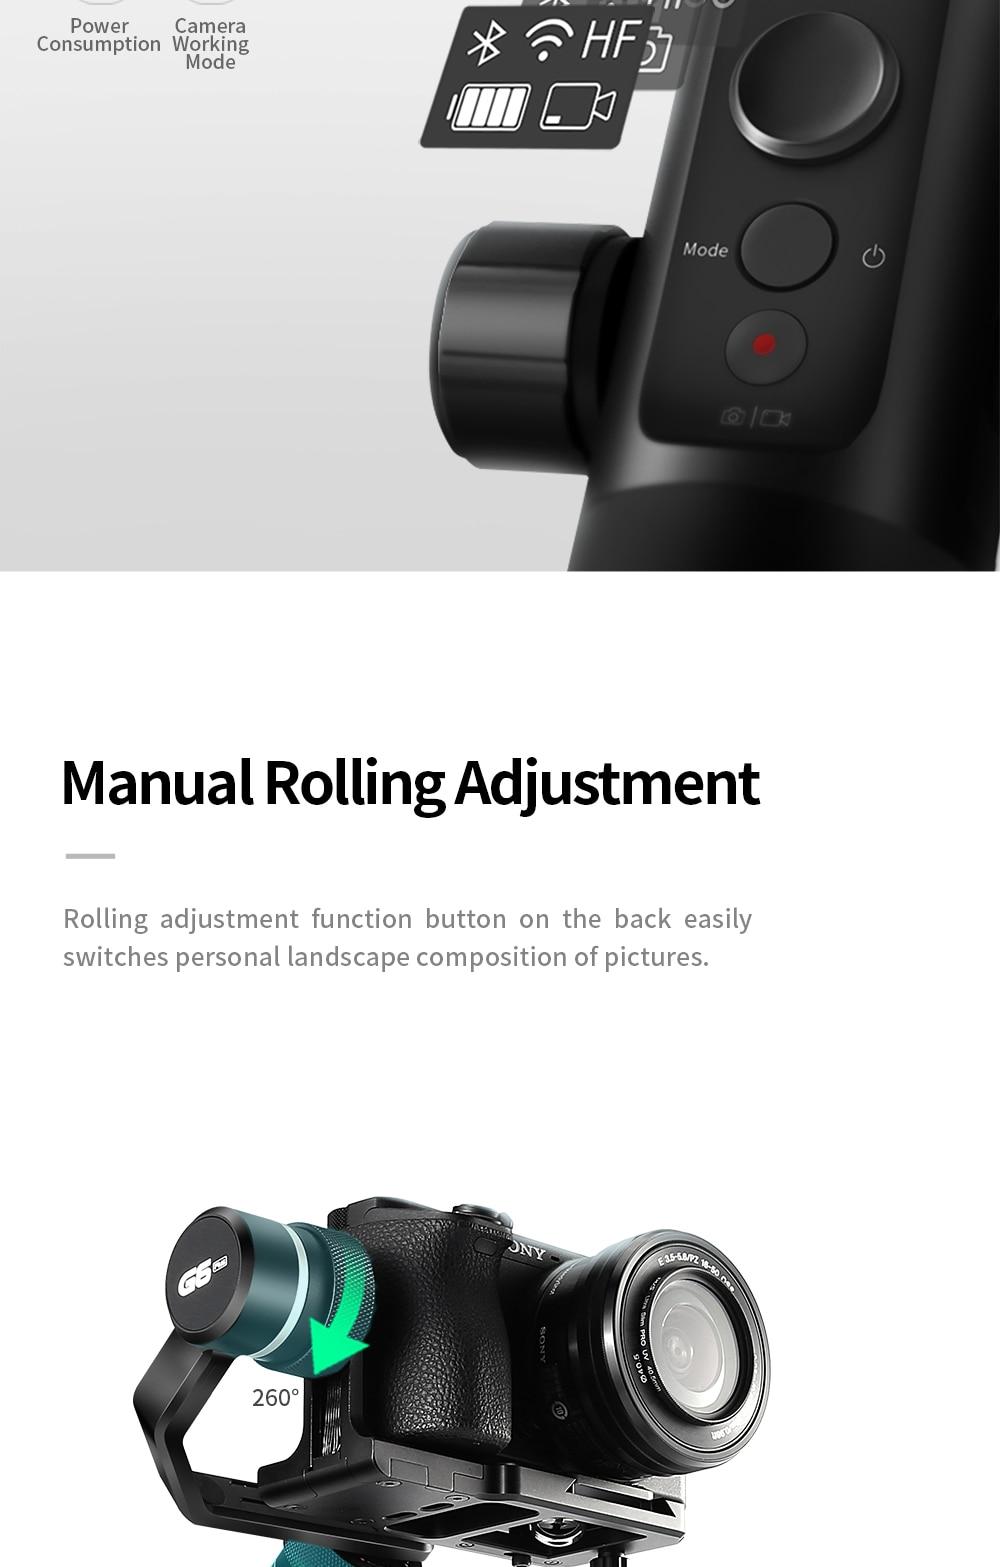 FeiyuTech G6 Plus 3-Axis Handheld Gimbal Stabilizer for Mirrorless Camera Pocket Camera GoPro Smartphone Payload 800g Feiyu G6P 7